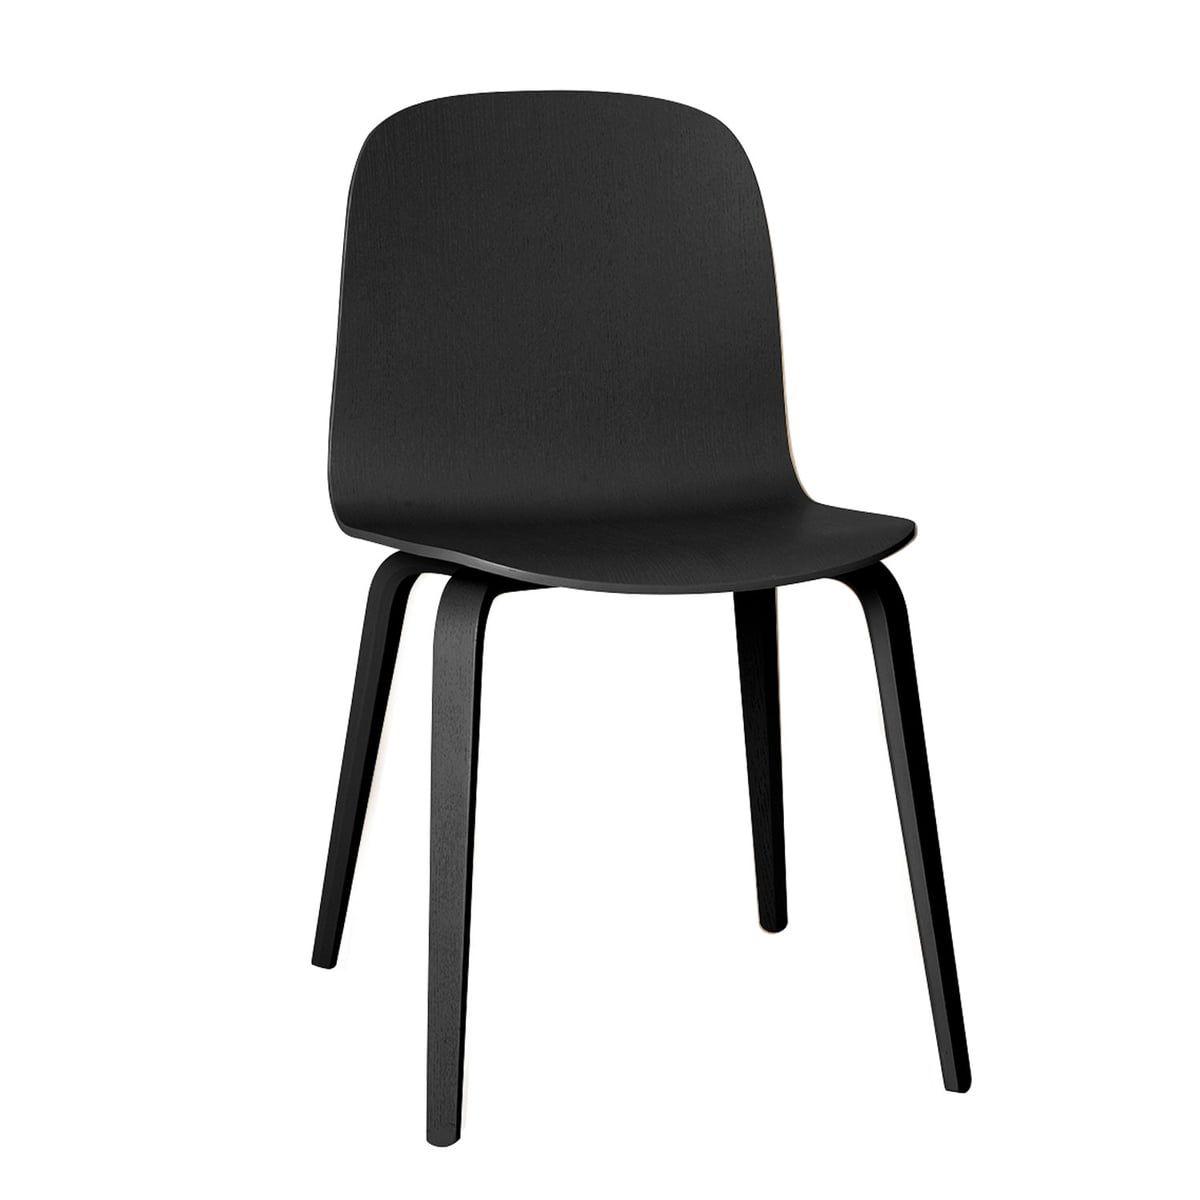 Visu Stuhl von Muuto | Connox